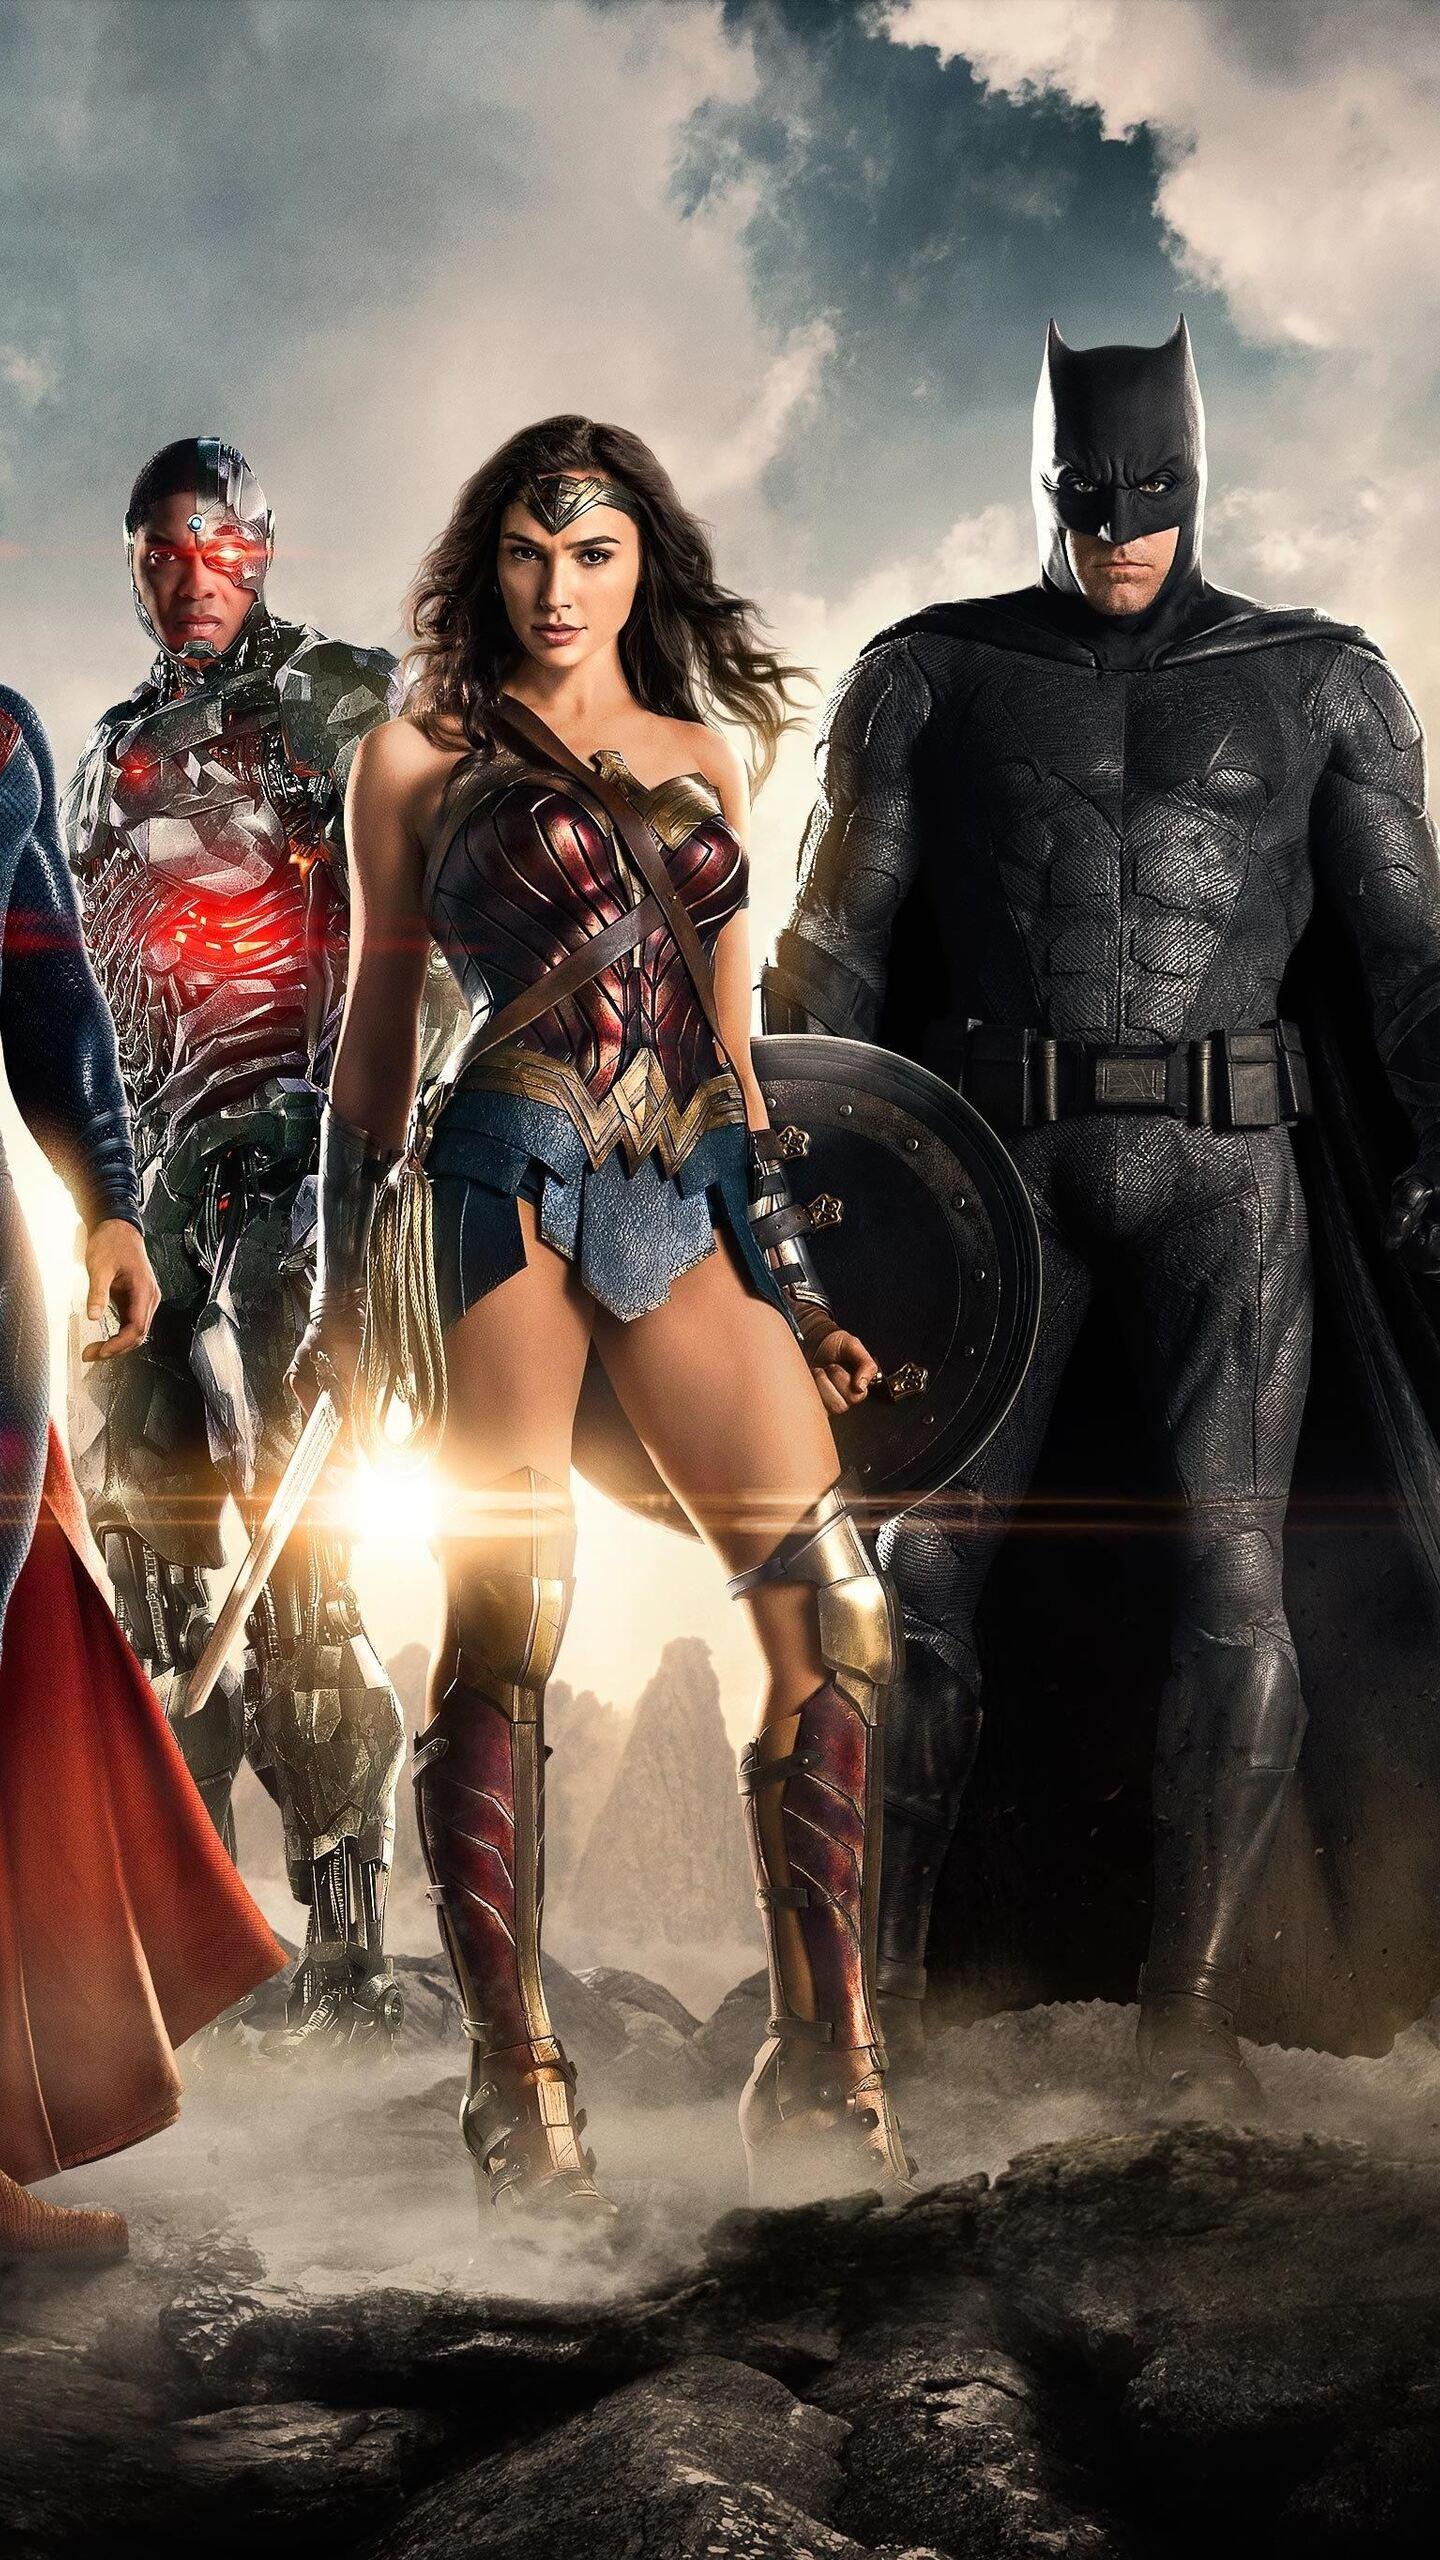 2017-justice-league-4k-4k.jpg